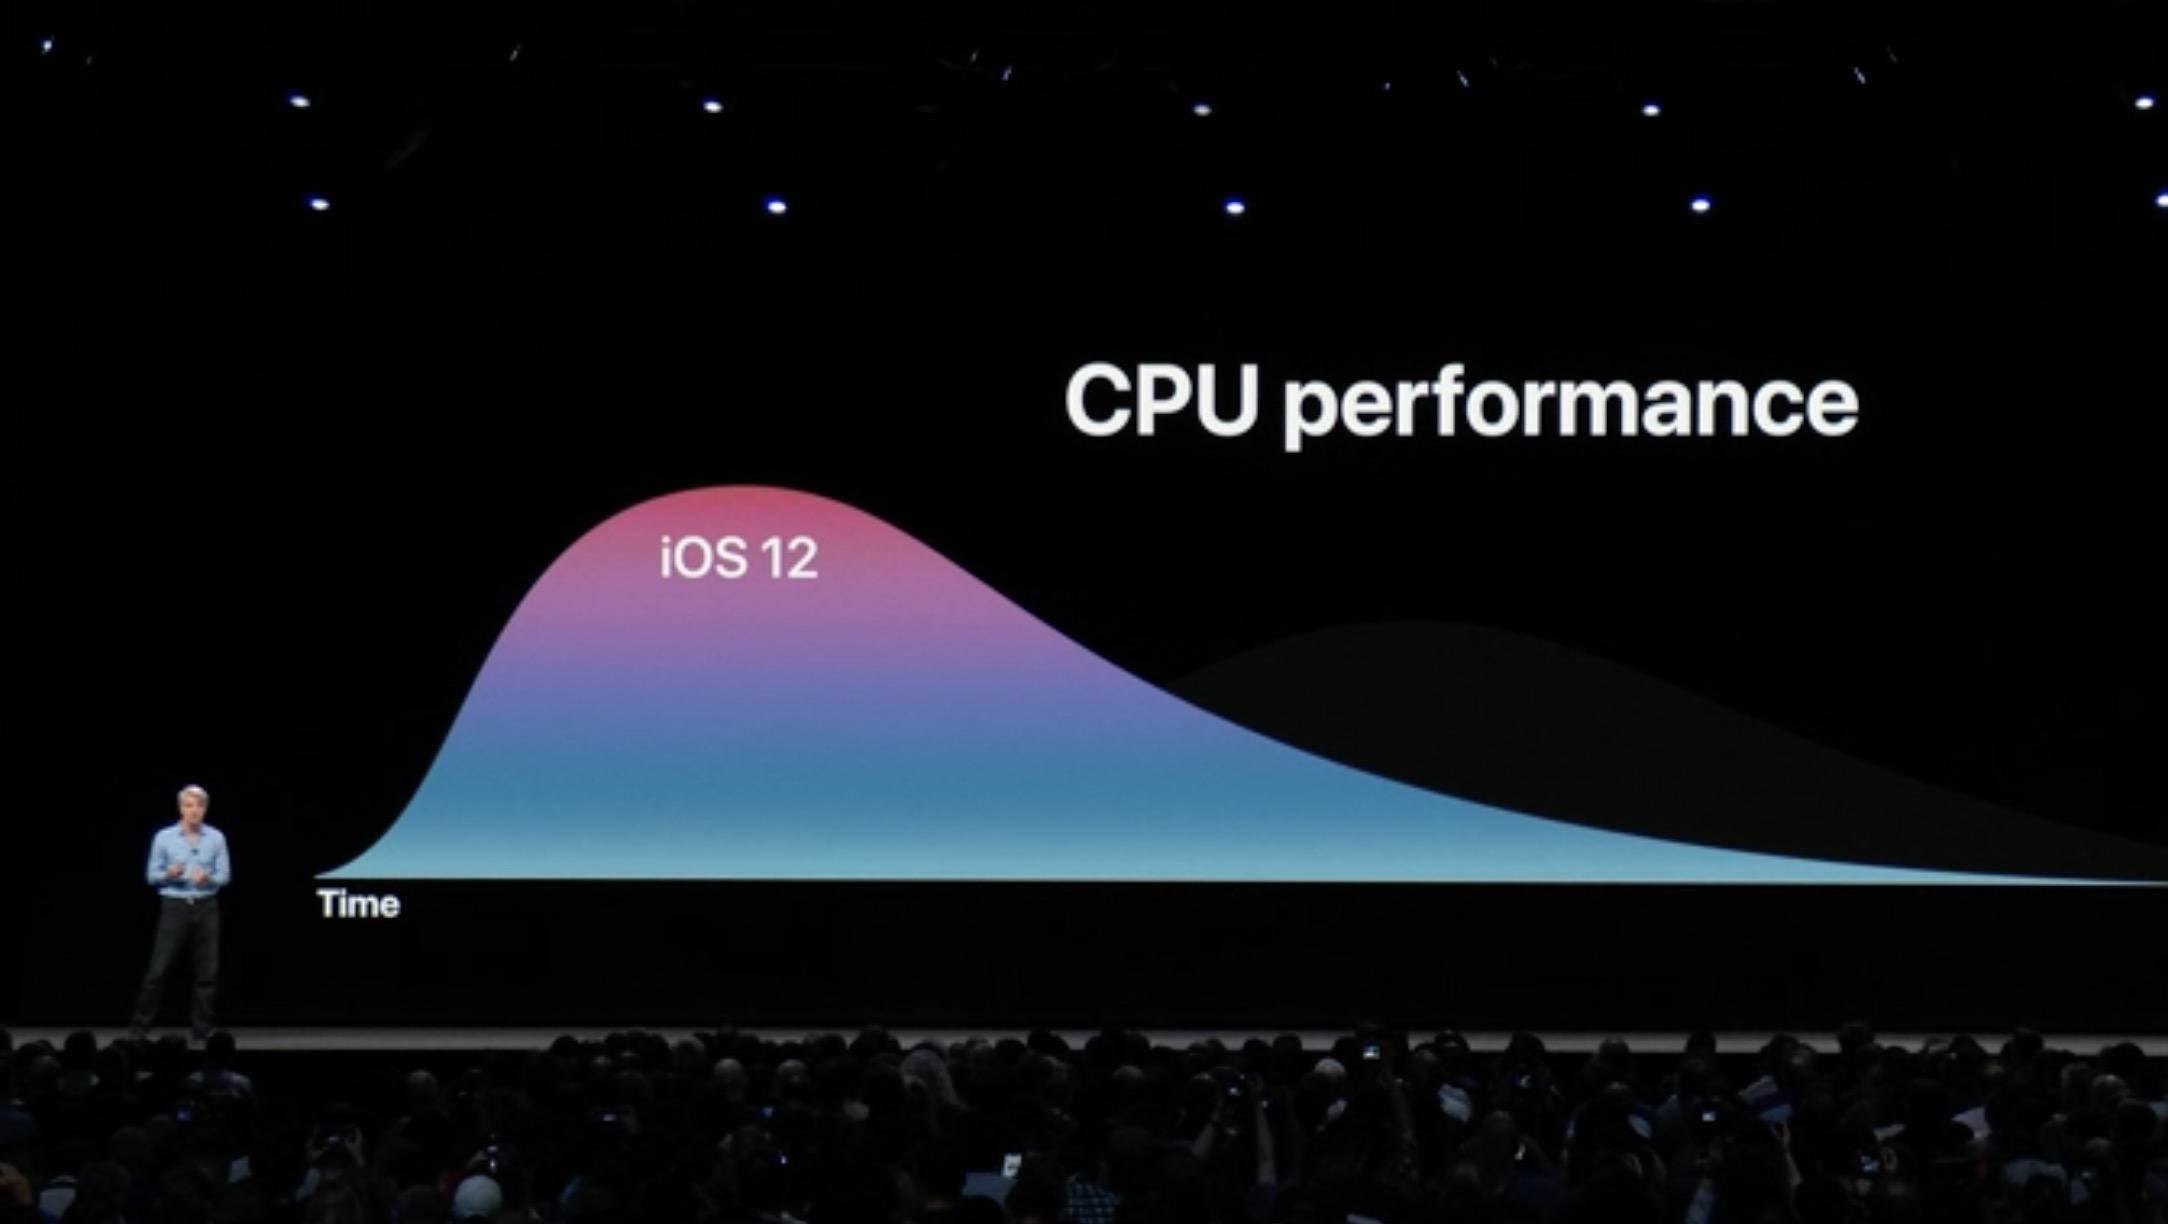 How to Fix Bad iOS 12 Beta Performance